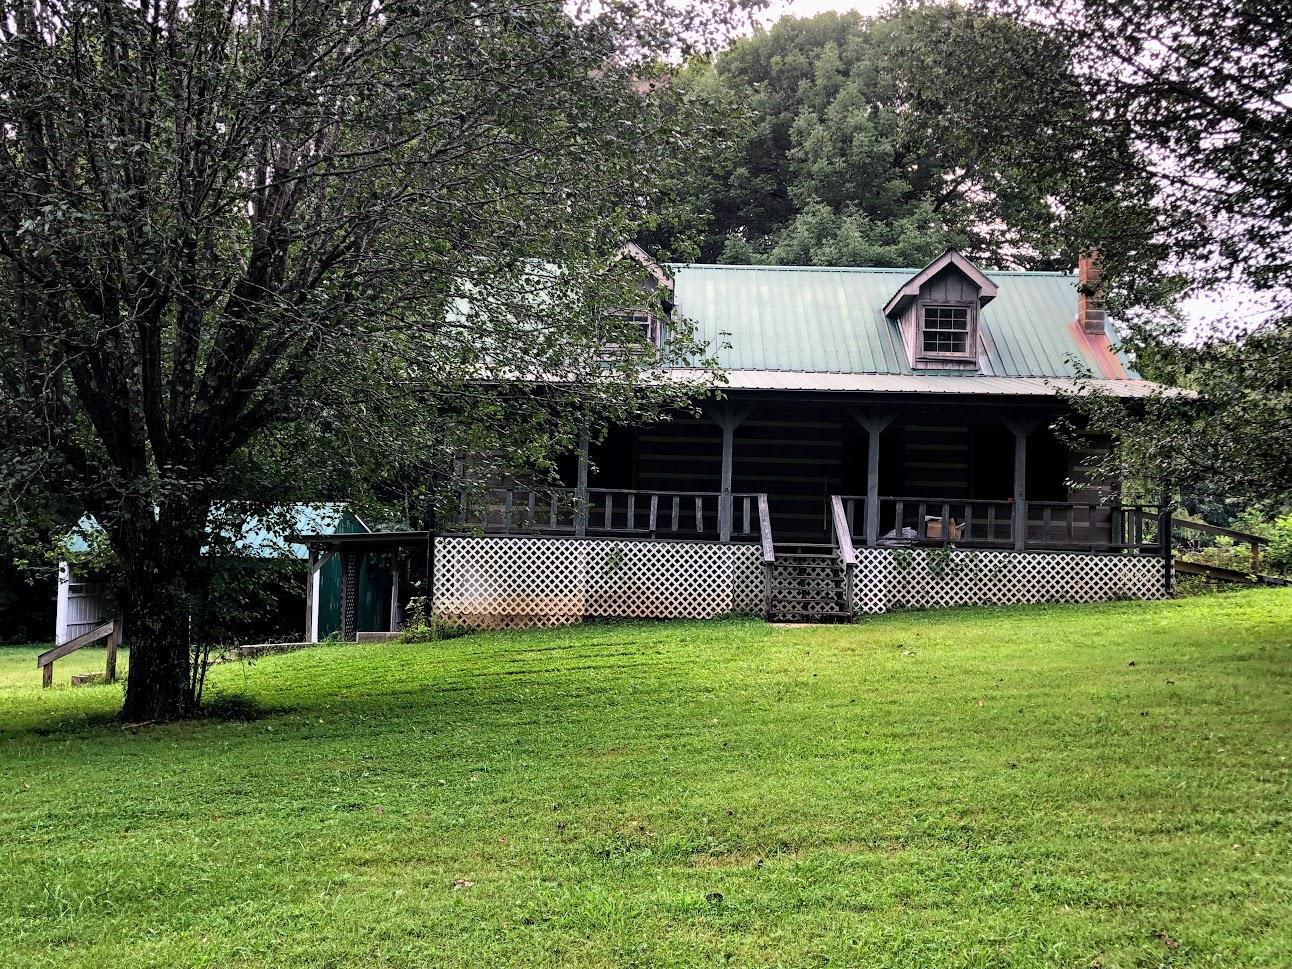 843 Pine Orchard Rd, Smithville, TN 37166 - Smithville, TN real estate listing